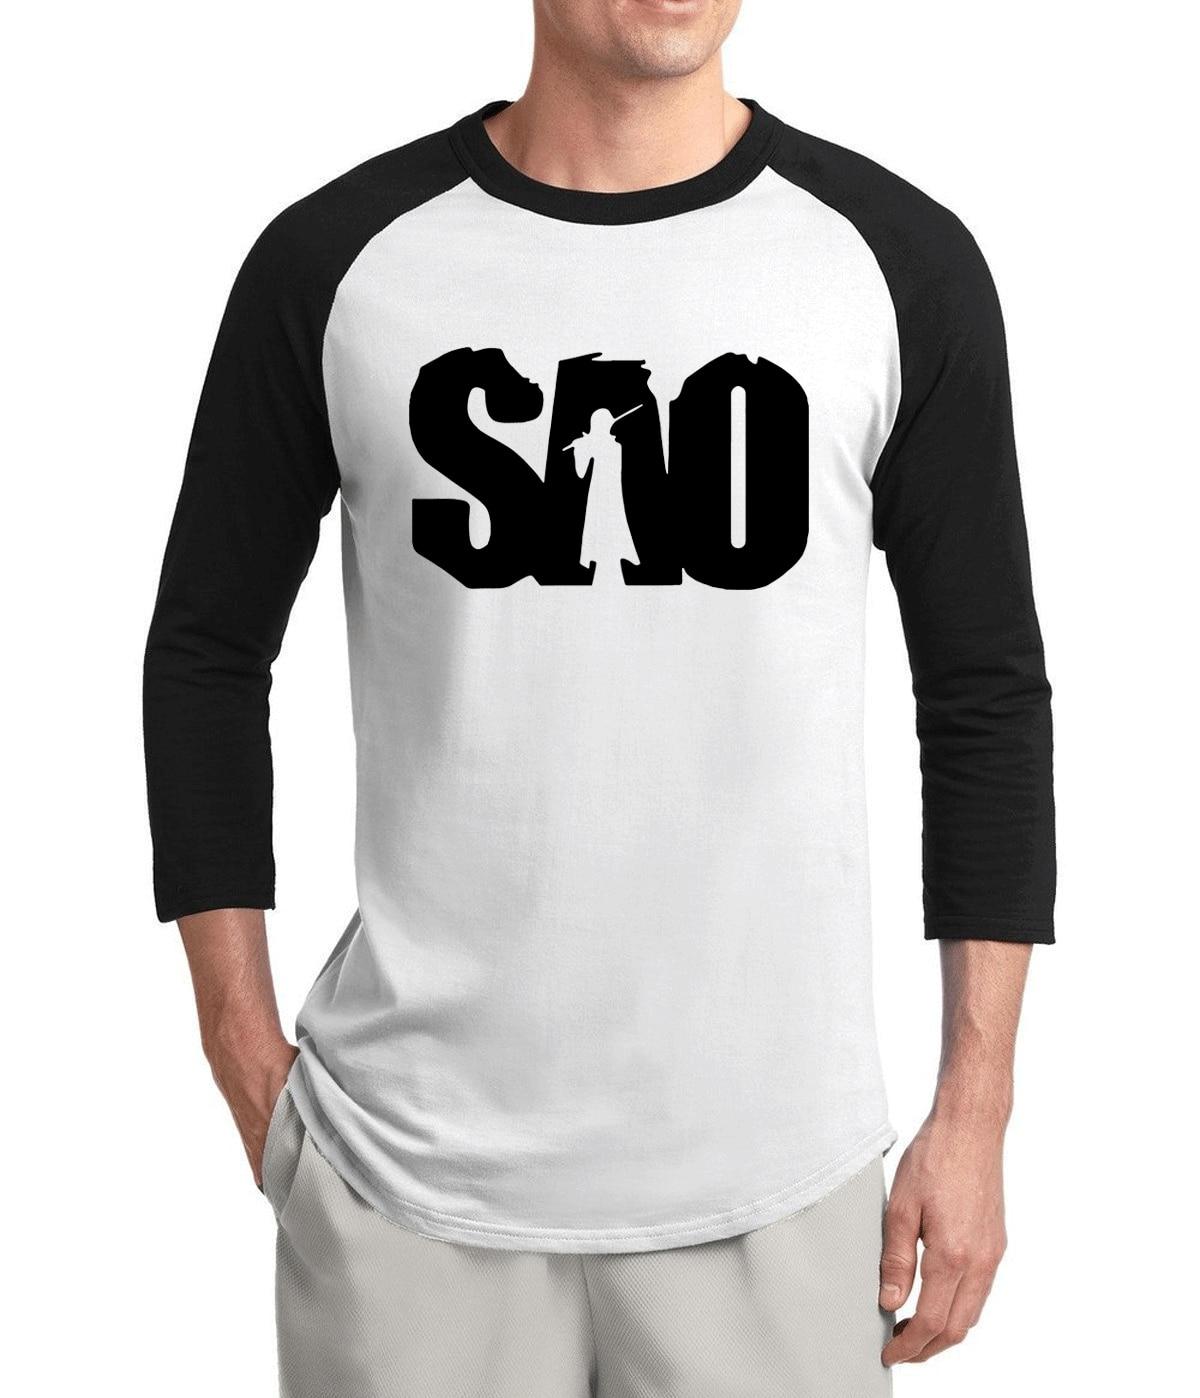 hot sale Anime Sword Art Online SAO 2017 new summer three quarter sleeve men t shirt 100% cotton high quality raglan t-shirt